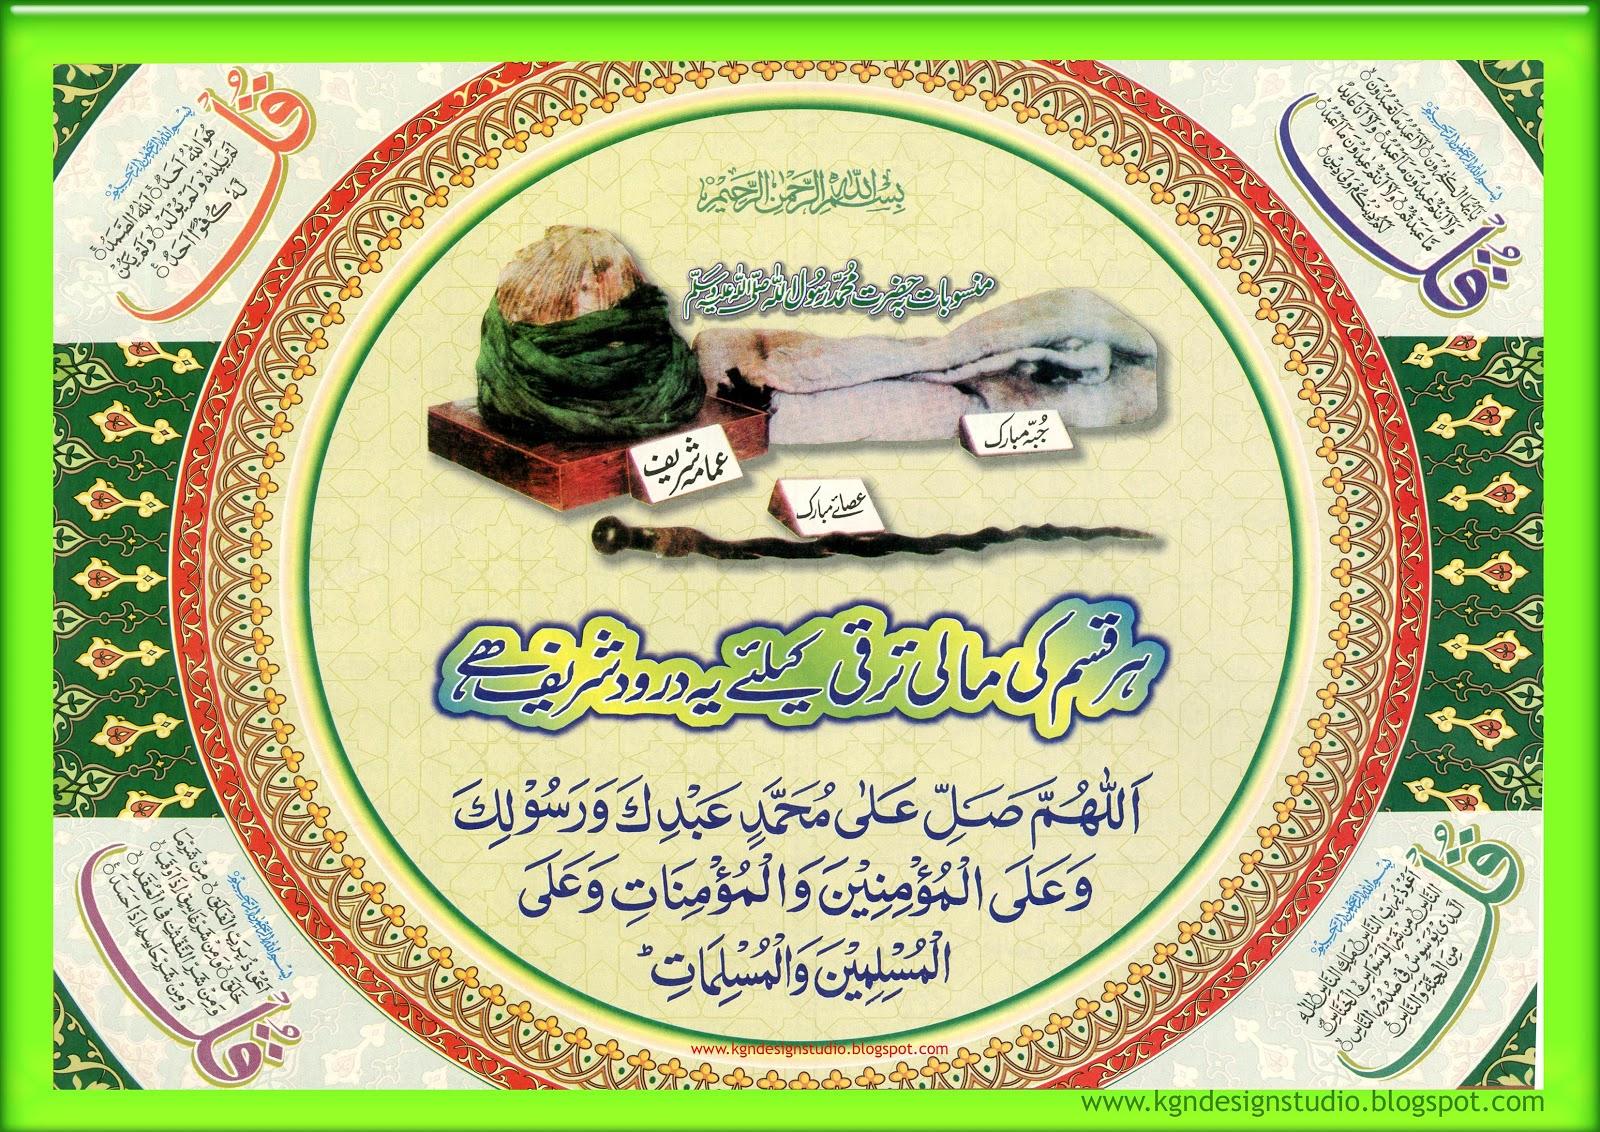 http://1.bp.blogspot.com/-GsfaVwDAvTA/UOgPujglNXI/AAAAAAAACWI/Fy8ehWJFJe0/s1600/Eid-e-Milad-Wallpaper-17.jpg